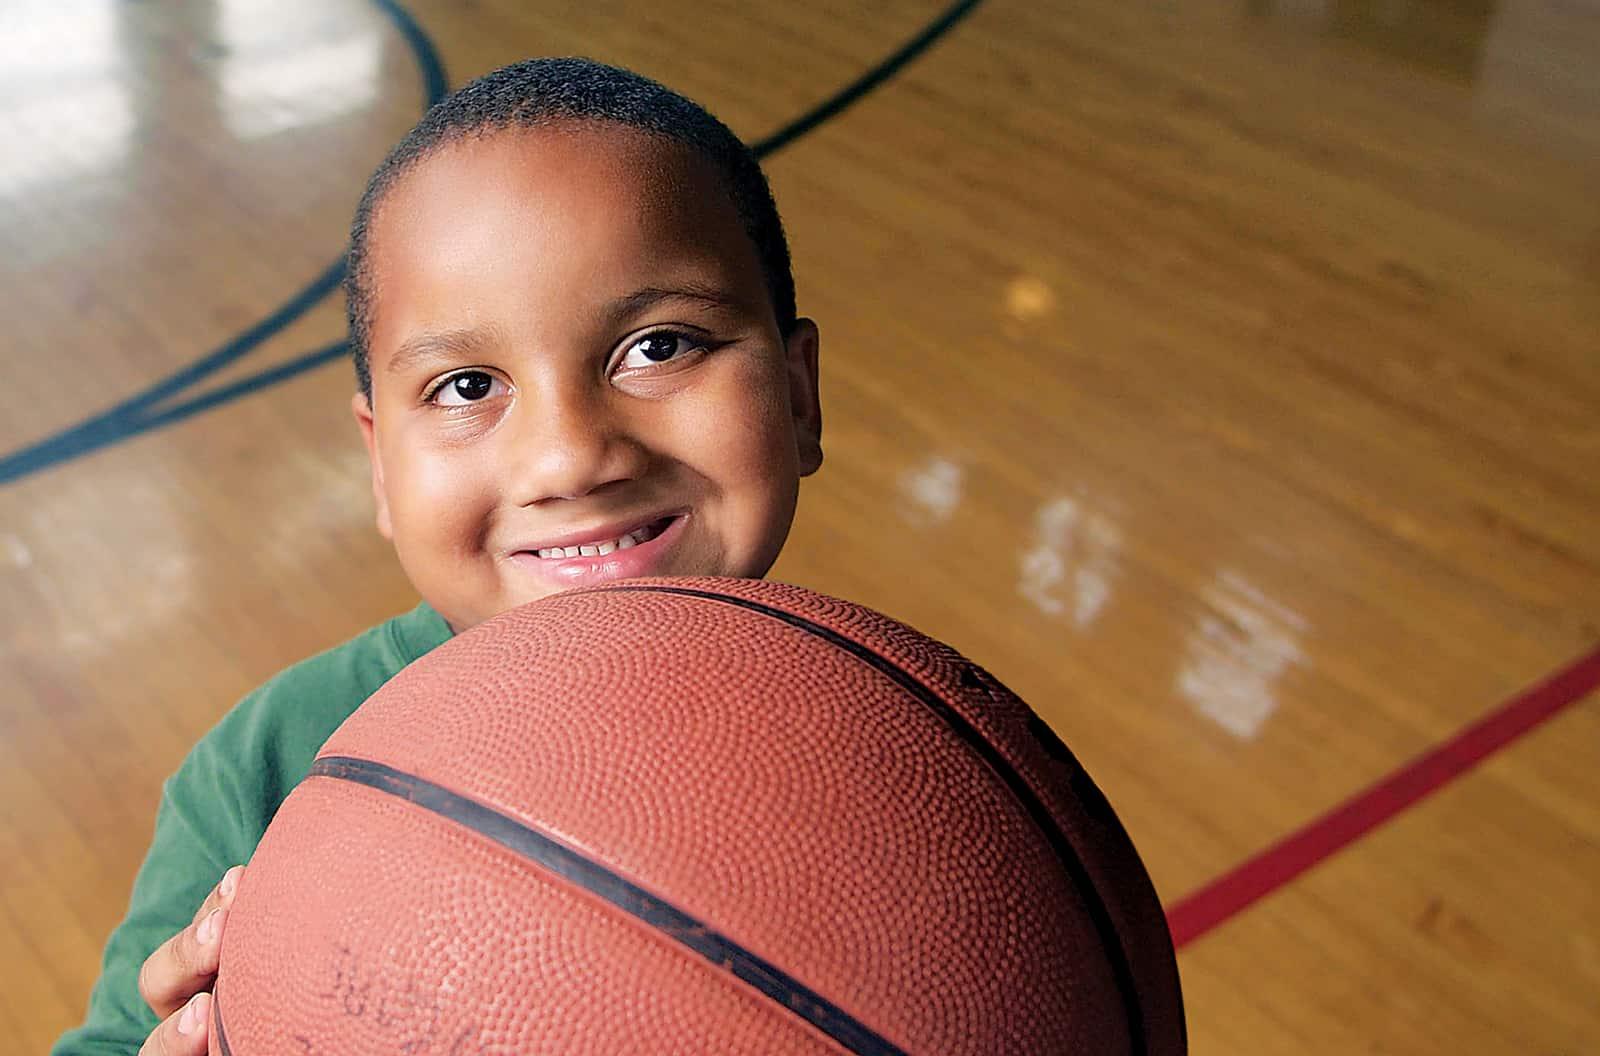 Boy holding basketball on court